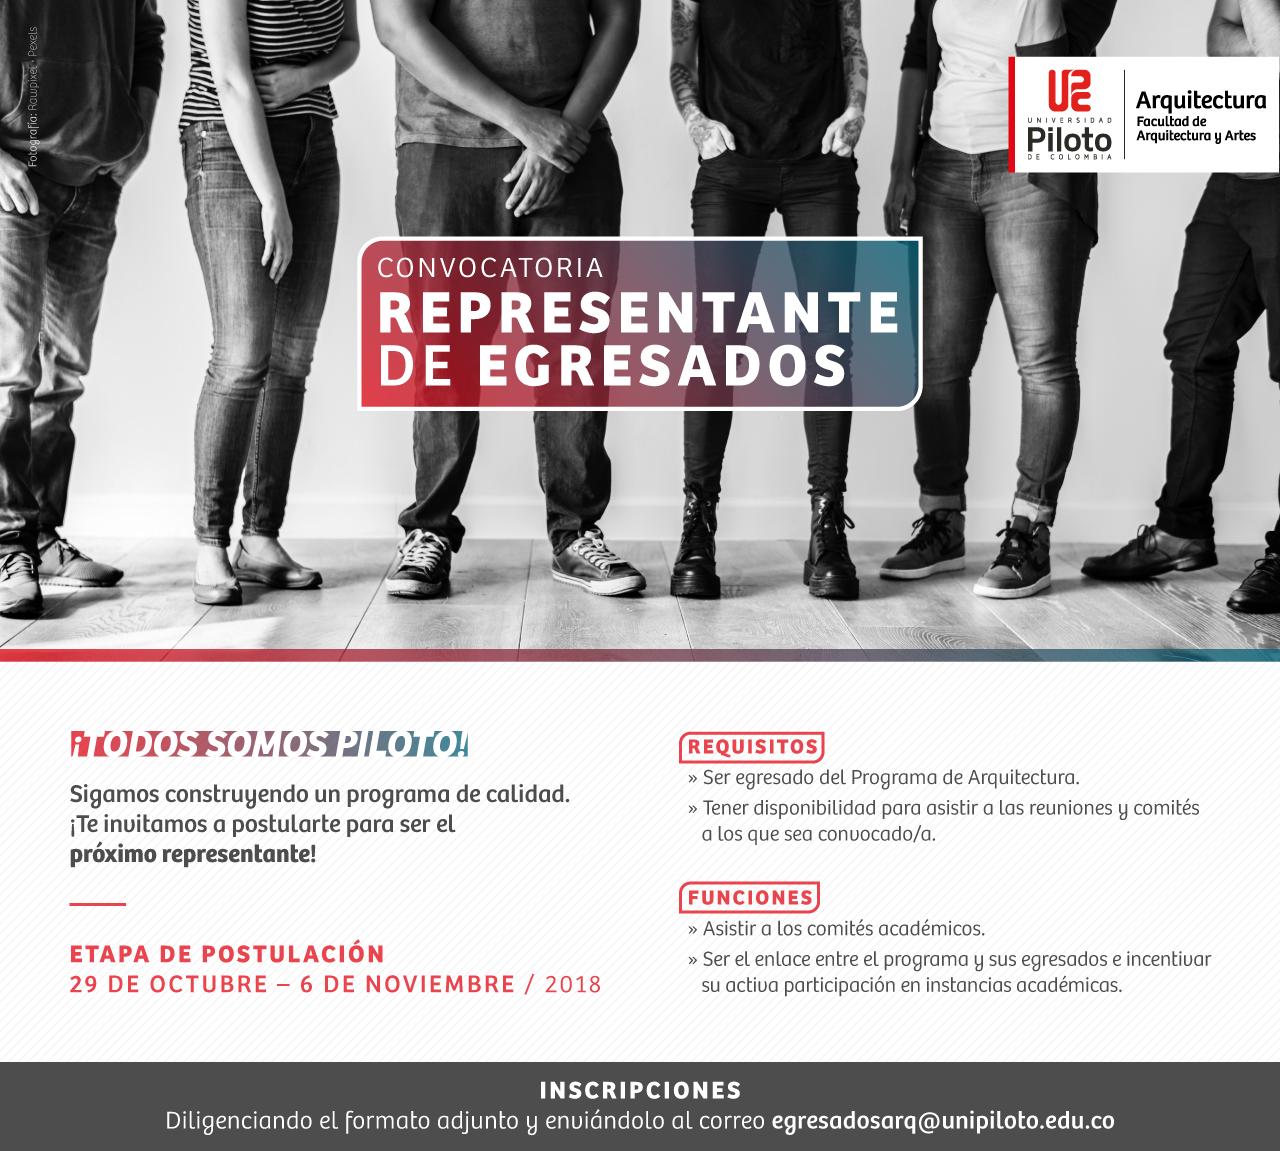 COM-492-182_INV_eleccion_representante_egresados-oct24